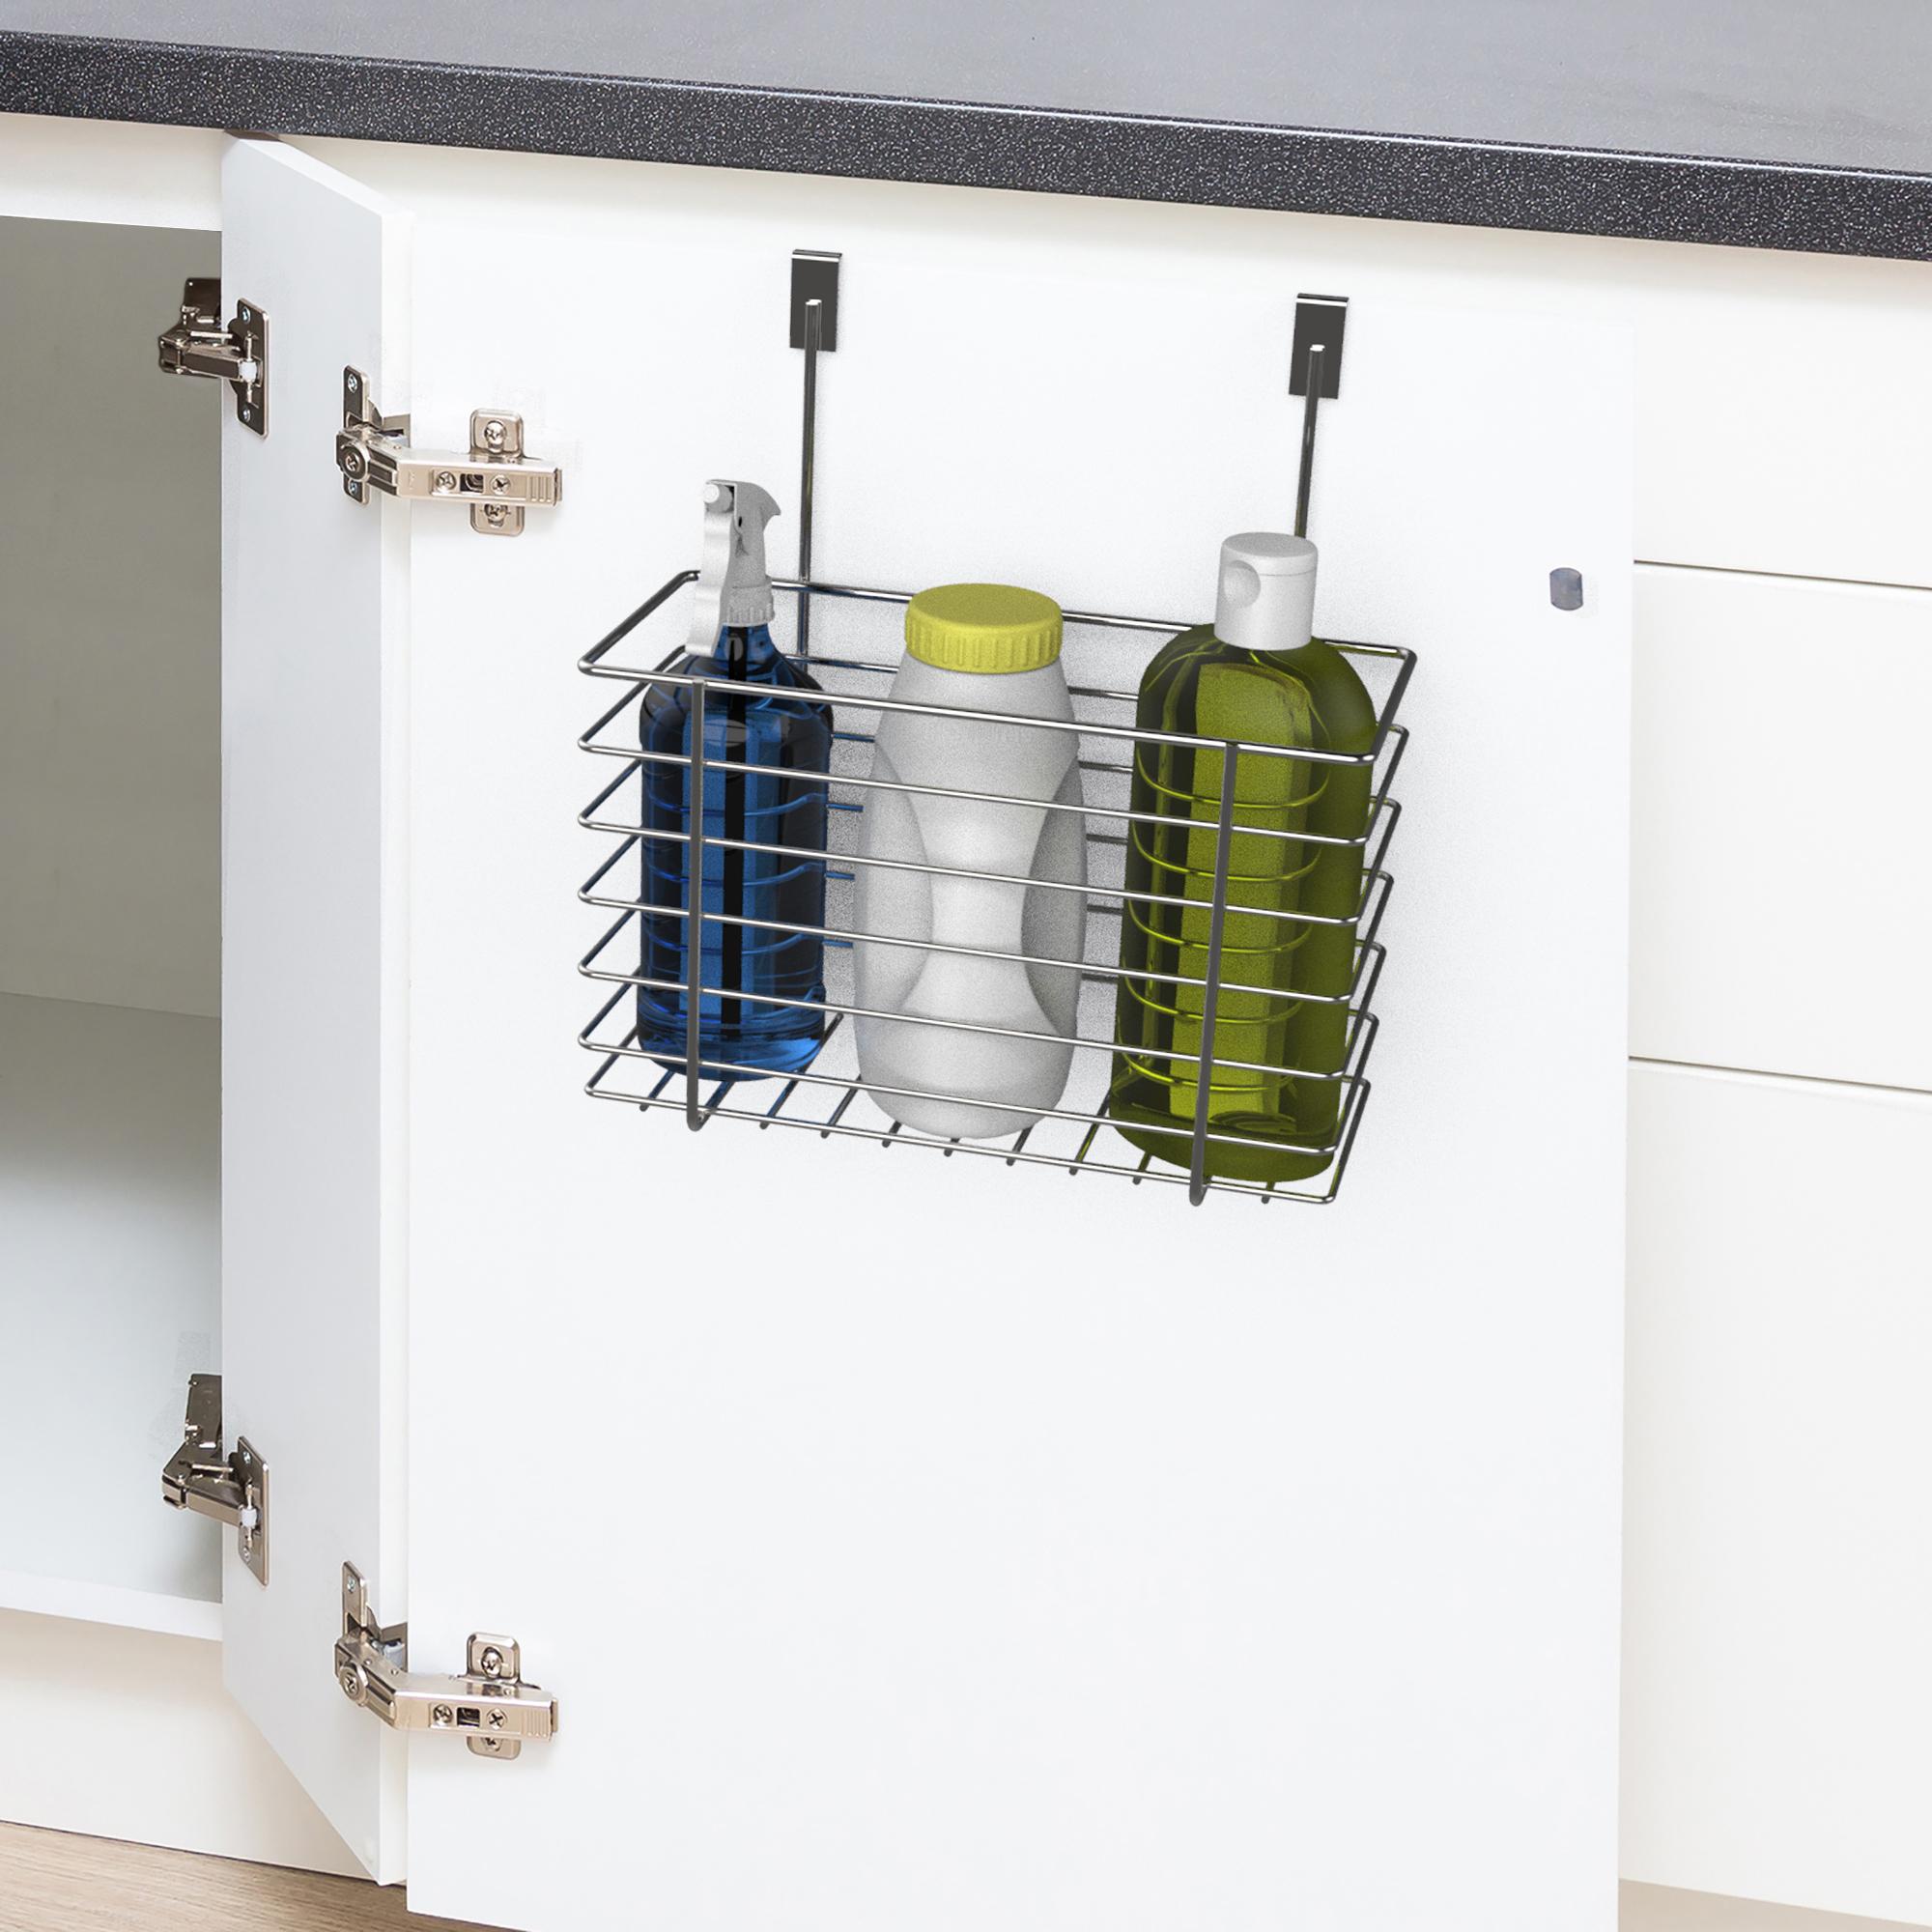 Metal Over the Cabinet Cupboard Door Caddy Bottle Spray Kitchen Storage Basket